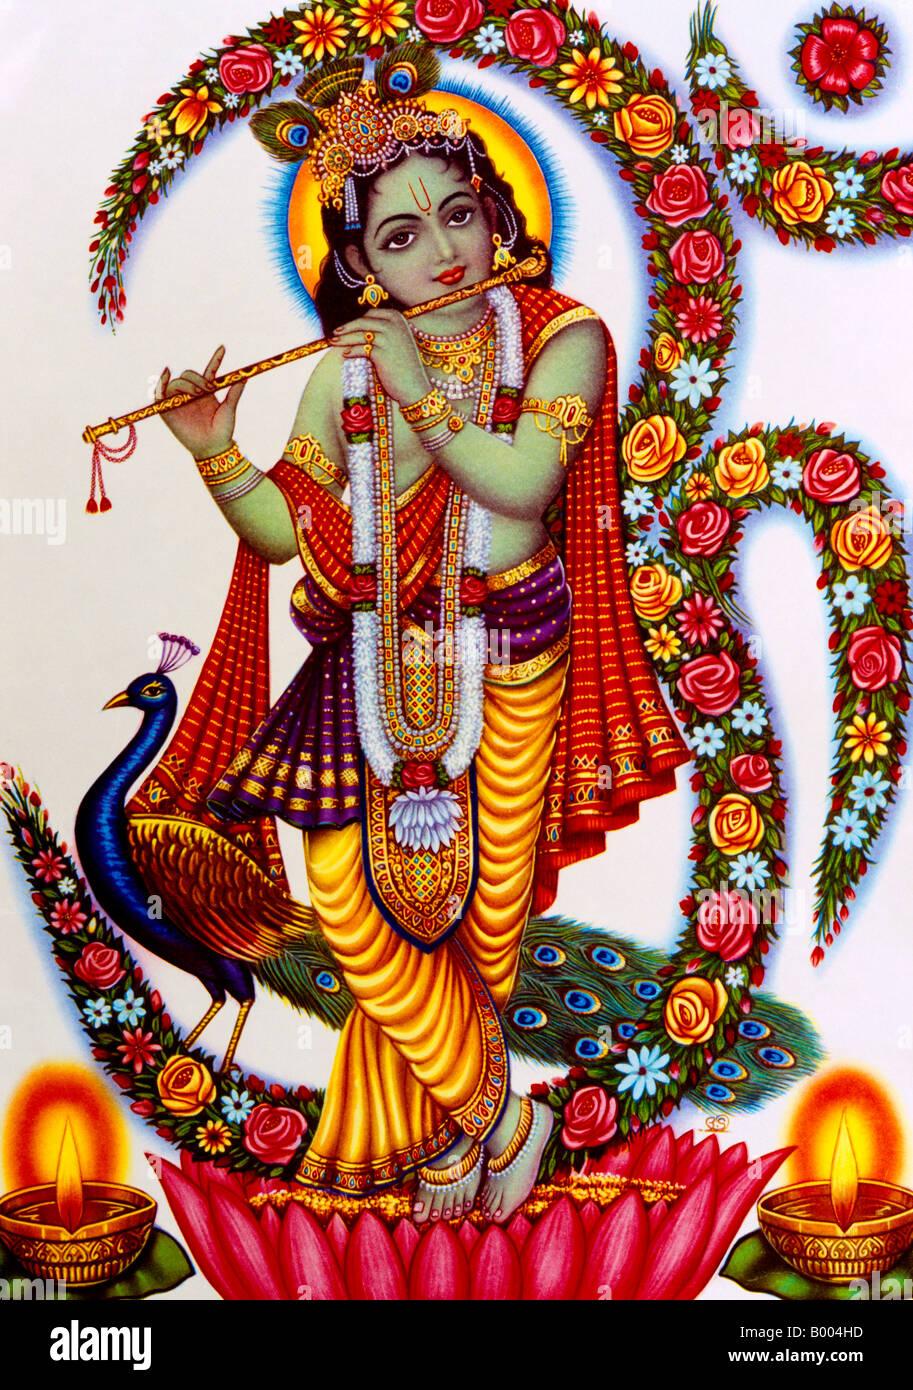 krishna playing flute hindu god stock photo 17213993 alamy